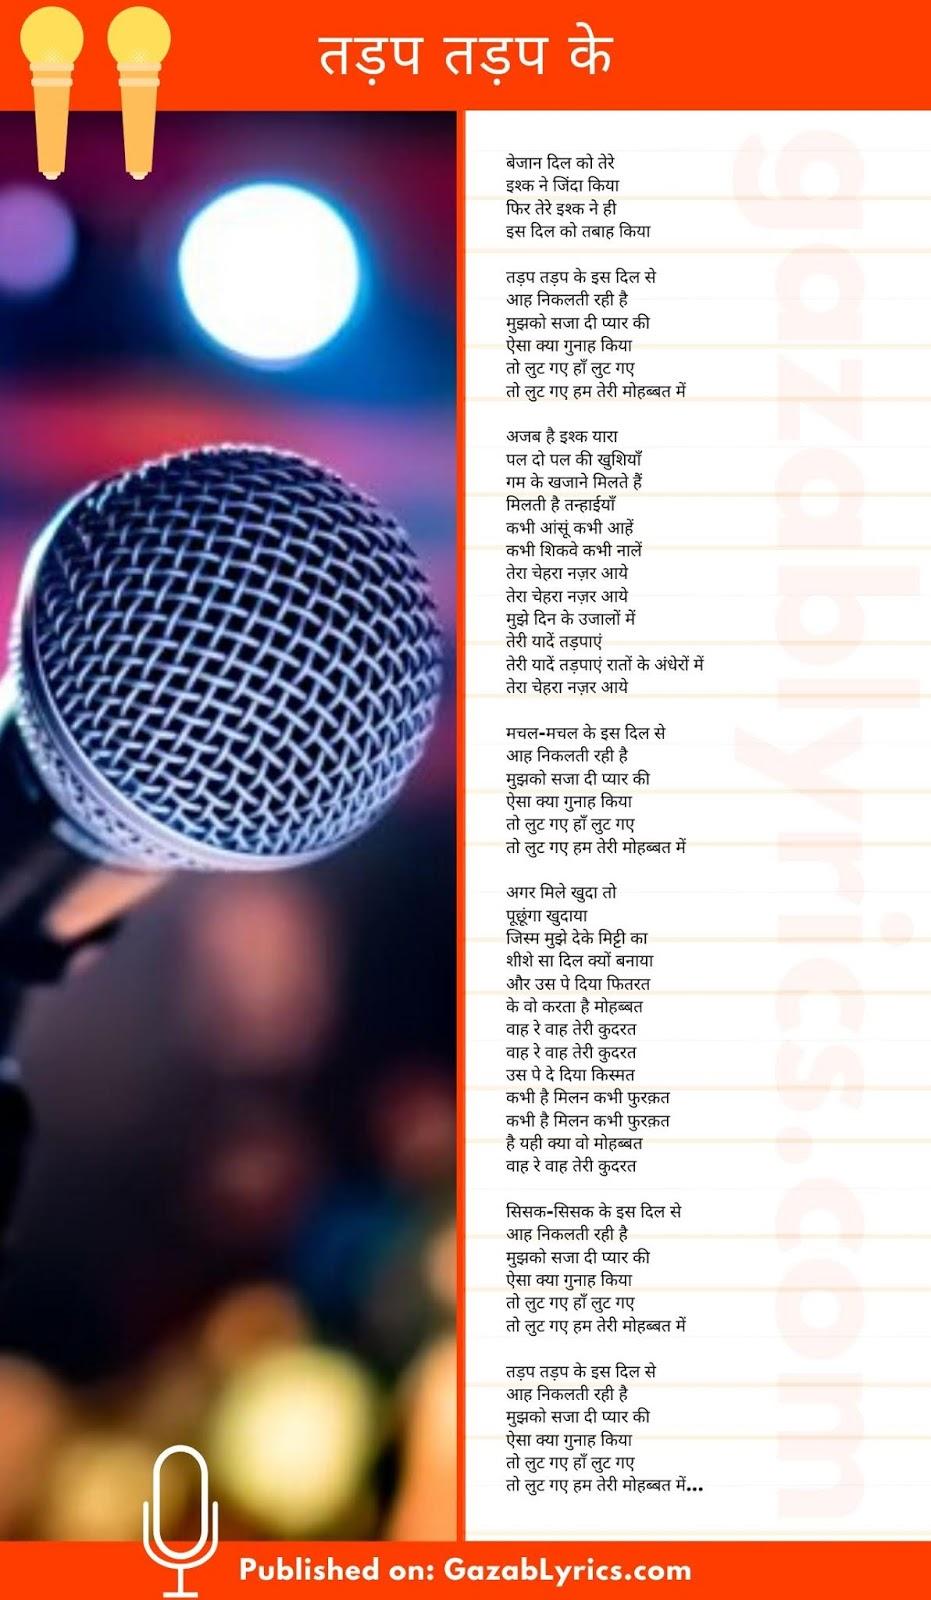 Tadap Tadap Ke song lyrics image